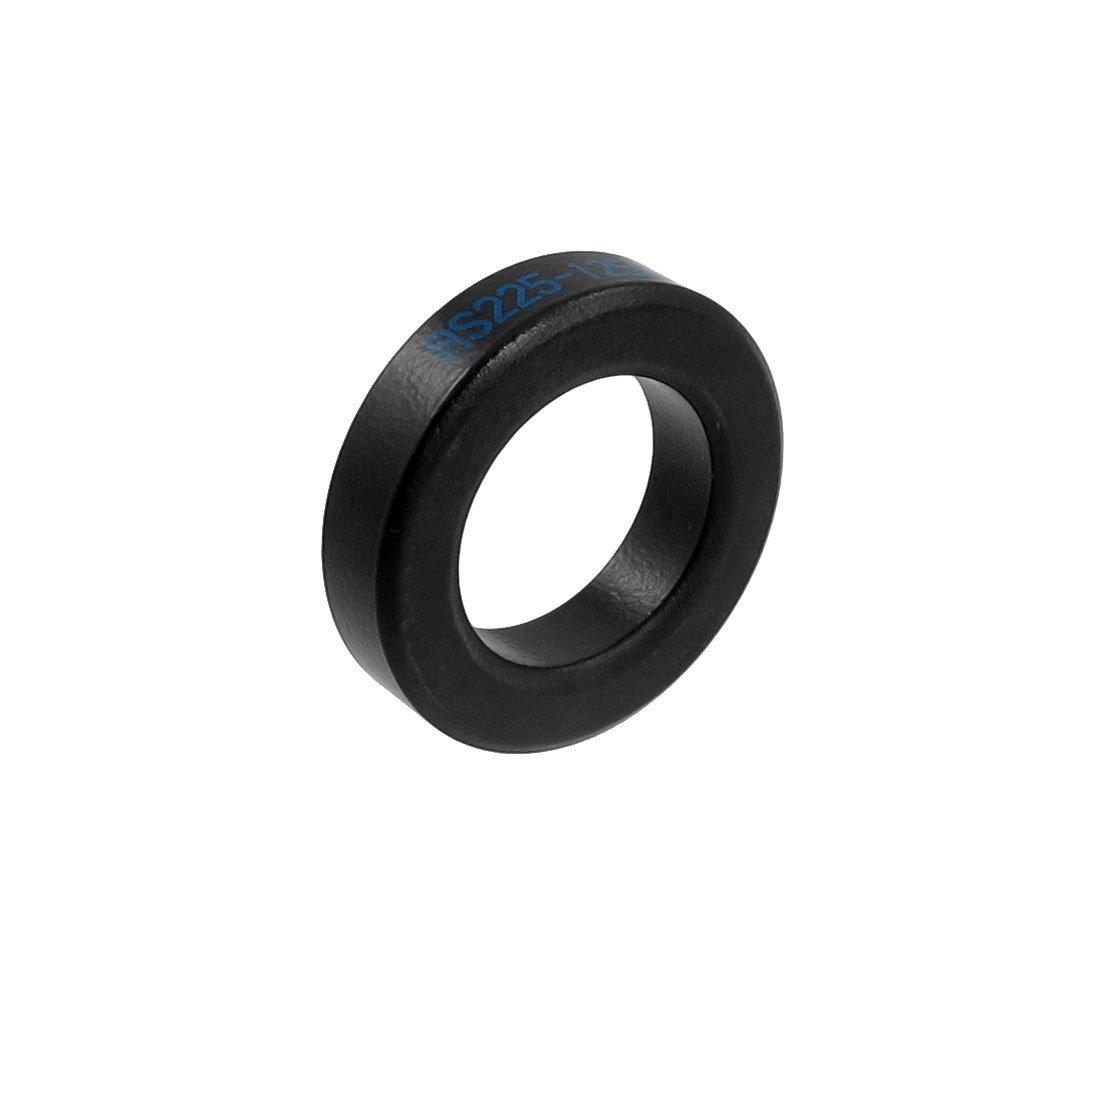 sourcingmap® 57mm x 35mm x 14mm Black Sendust Magnetic Powder Ferrite Core Ring AS225-125A a12083000ux0211